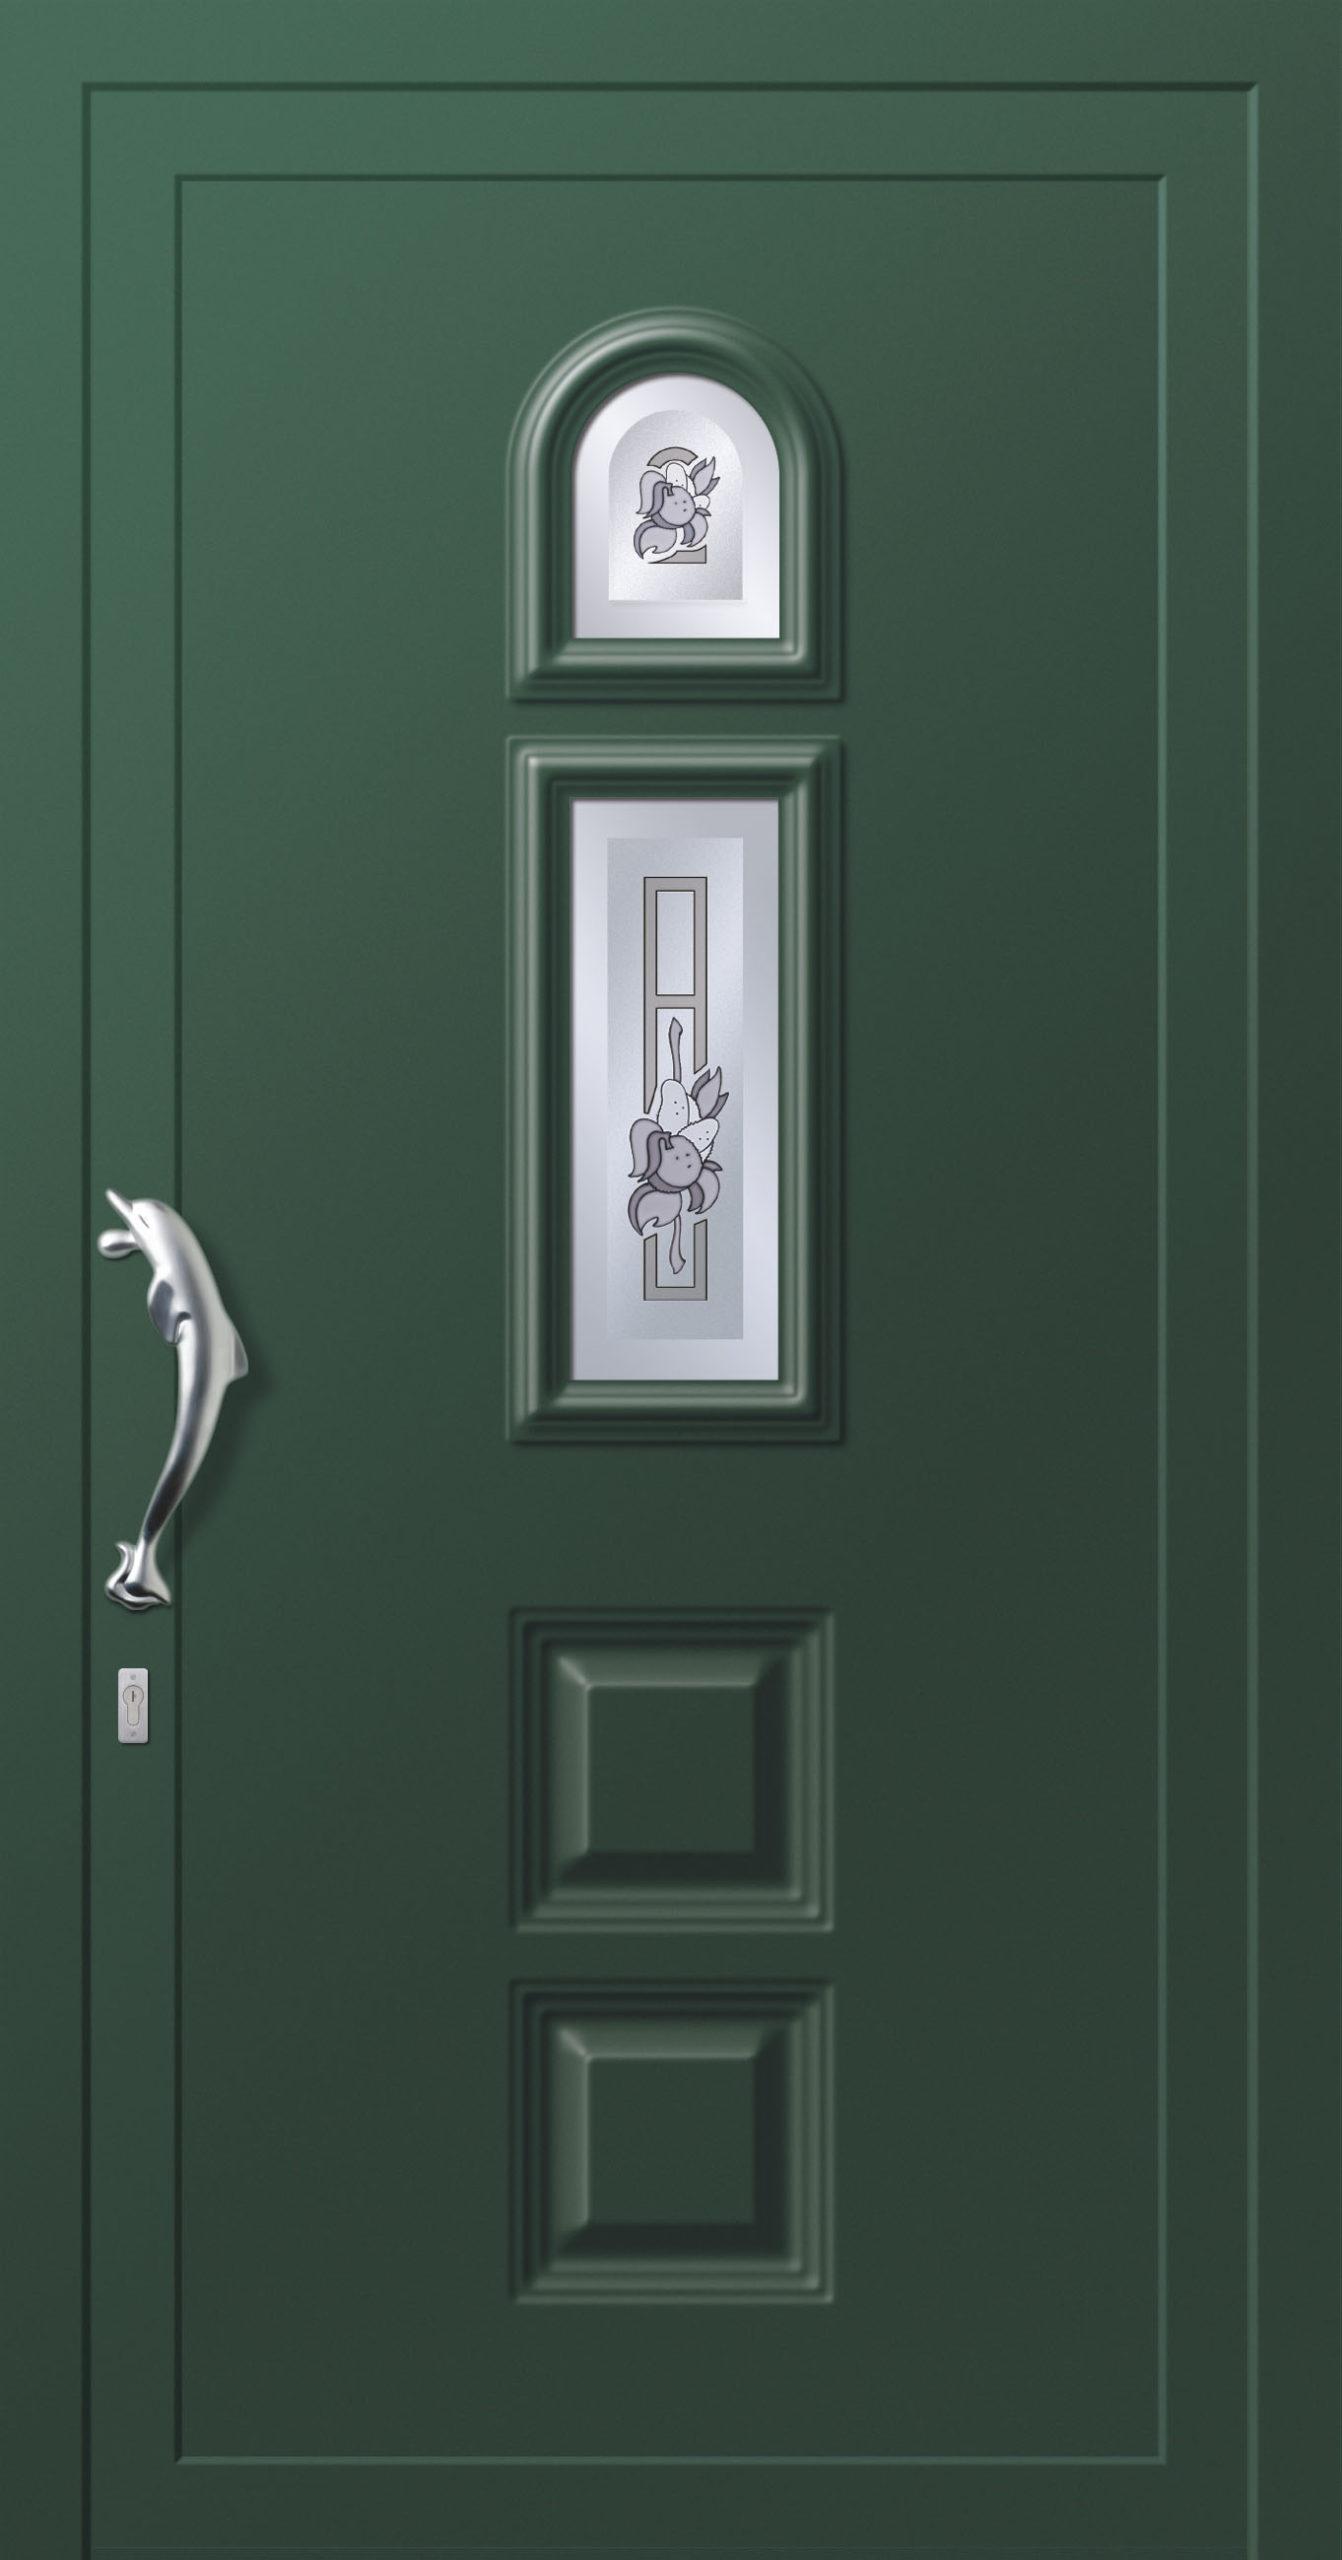 Entry Doors Linea Classica 129